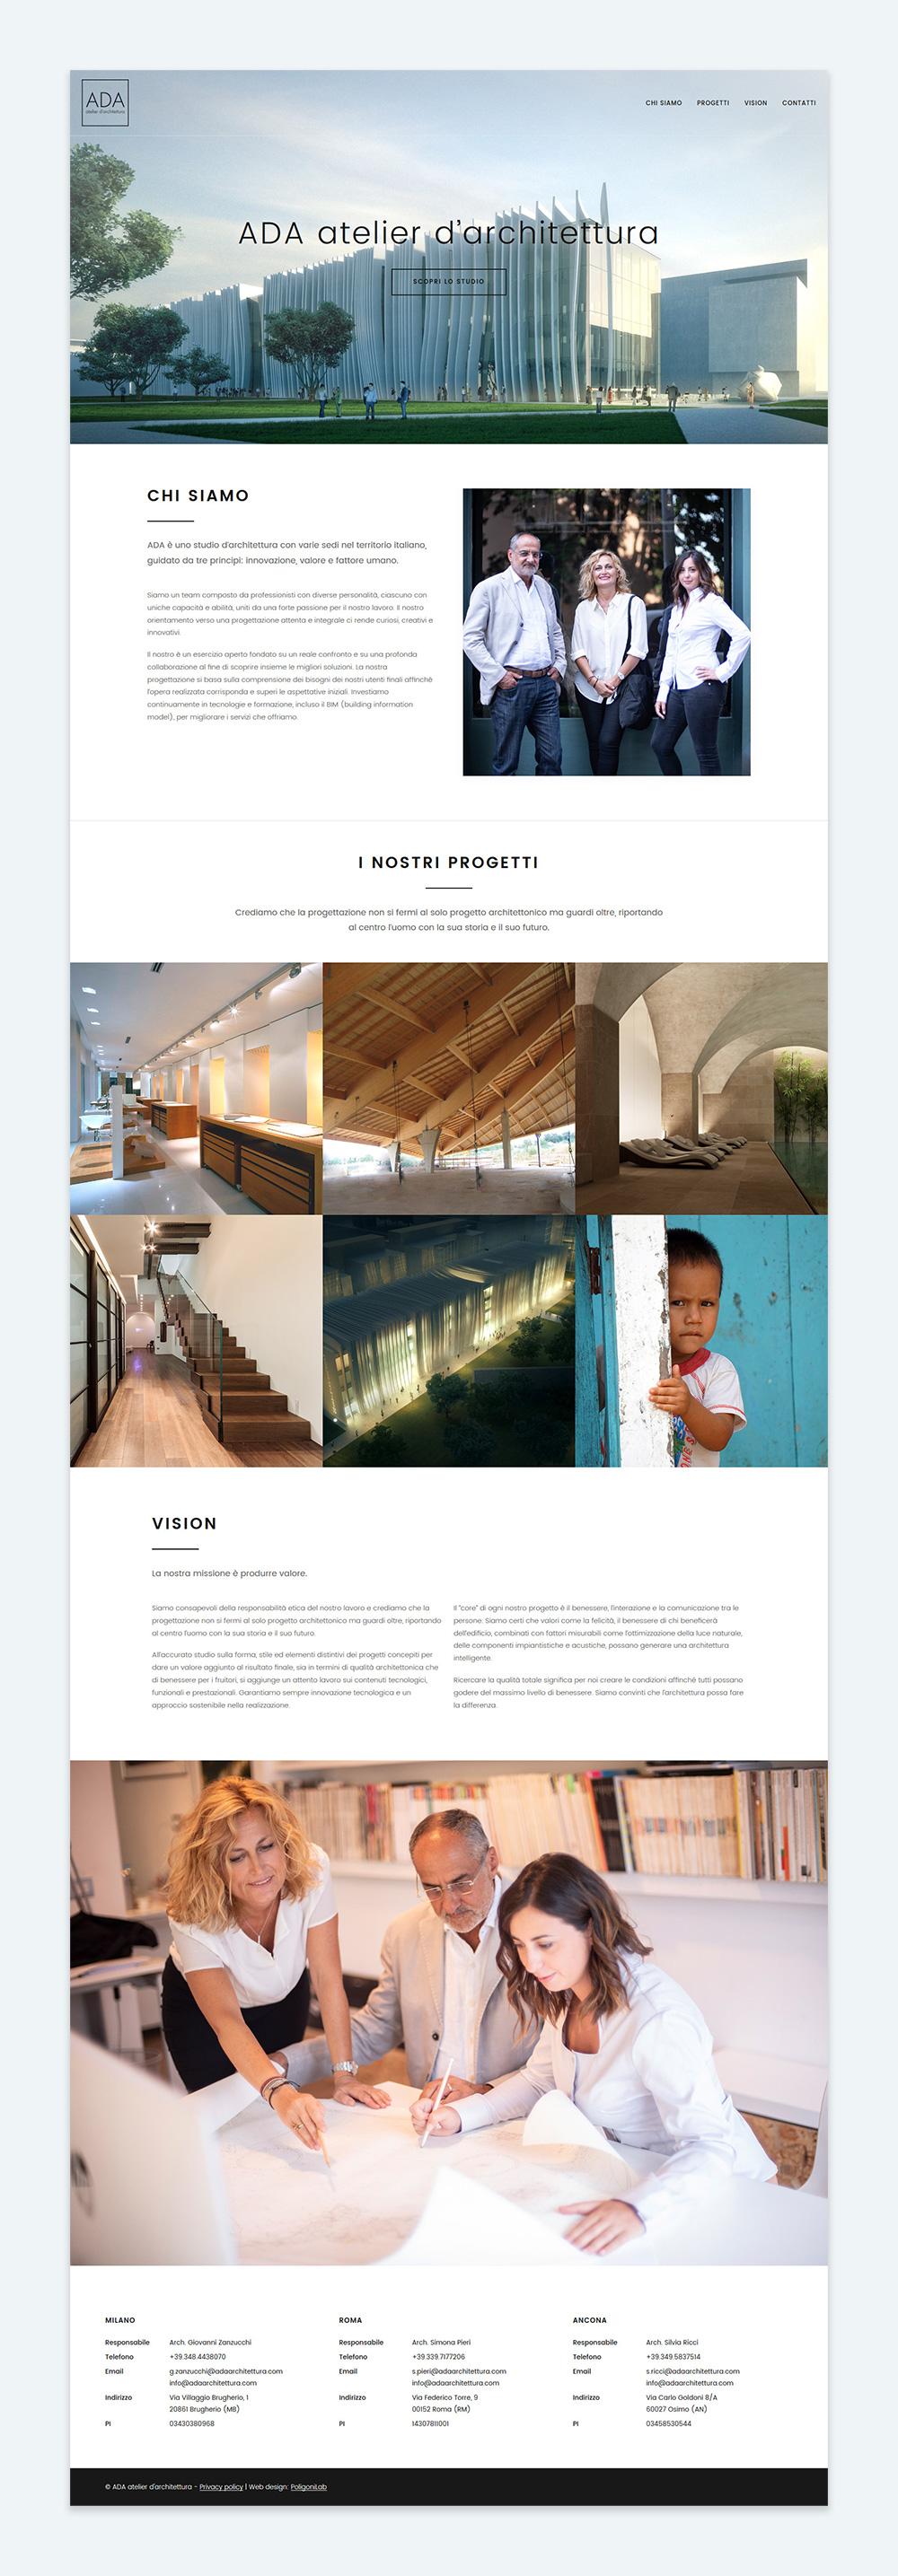 Studi Architettura Roma Lavoro ada atelier d'architettura – poligonilab, agenzia creativa